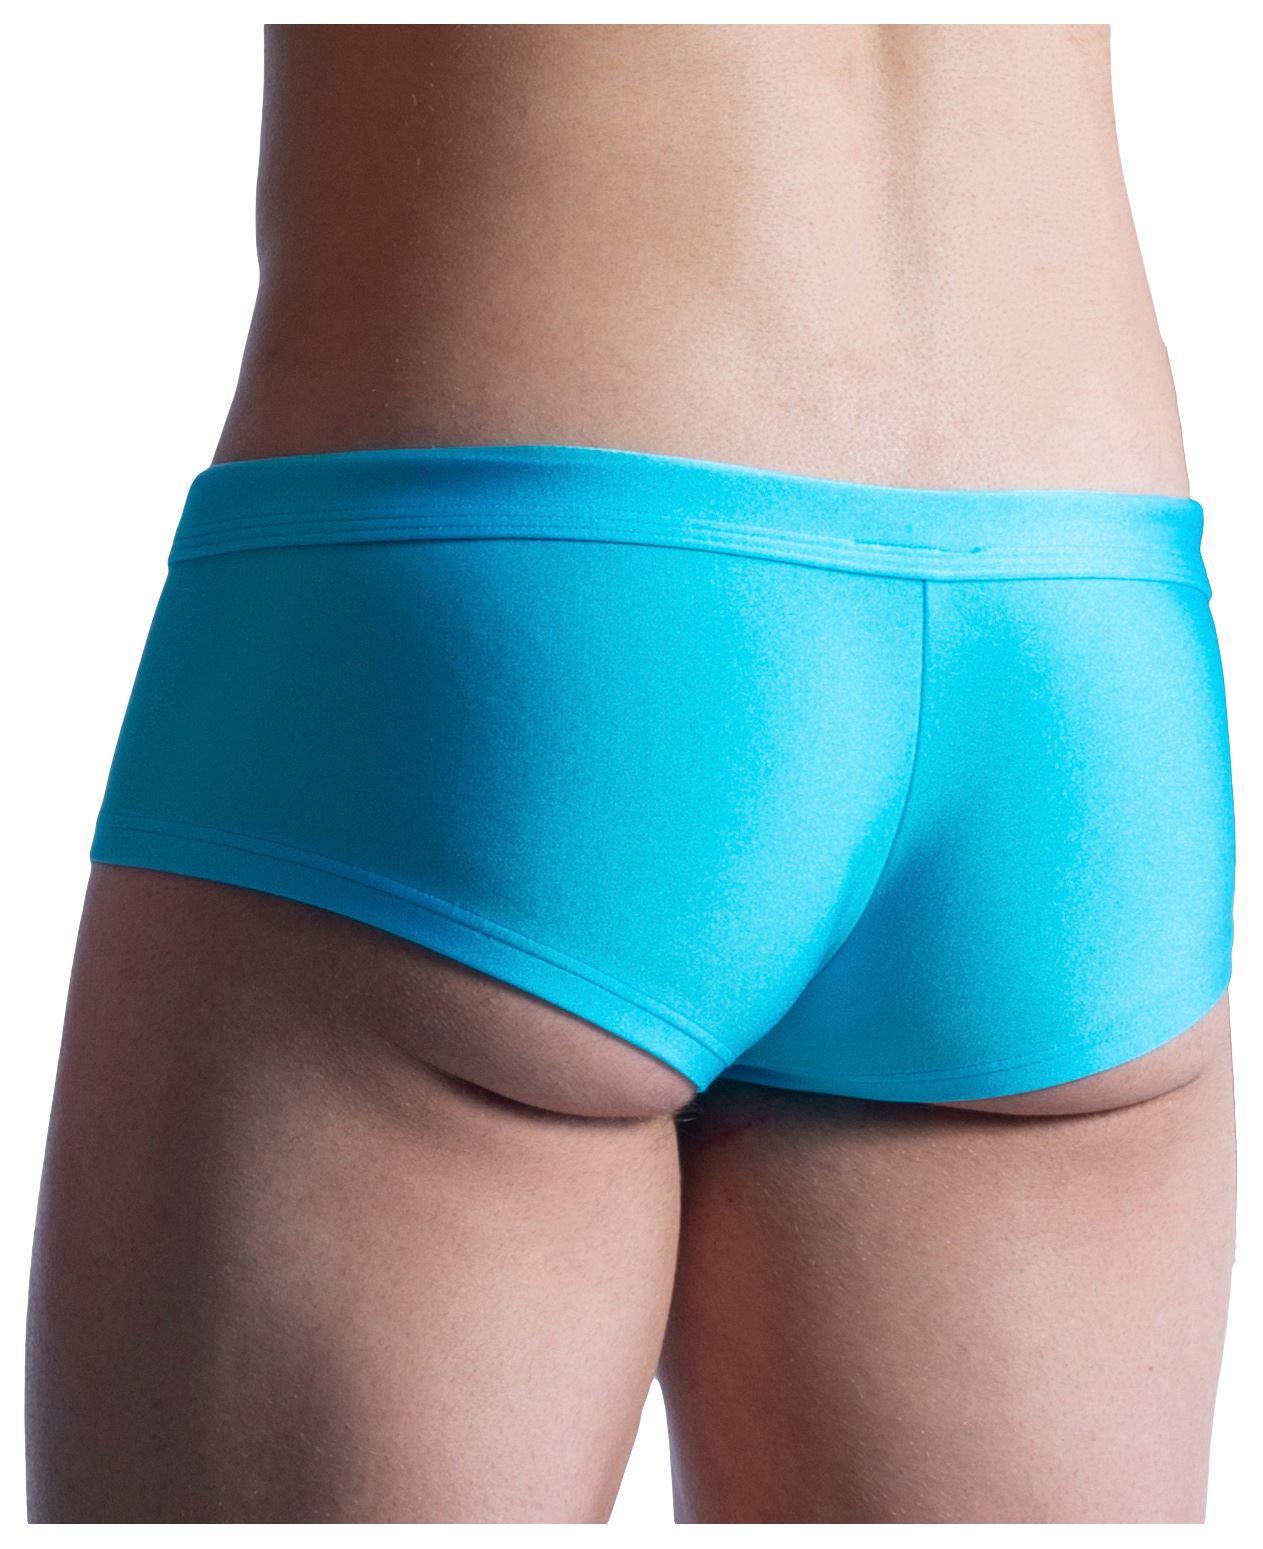 3c5b40ec9c Manstore M859 Beach Hot Pants men's swimwear boxer brief male high ...